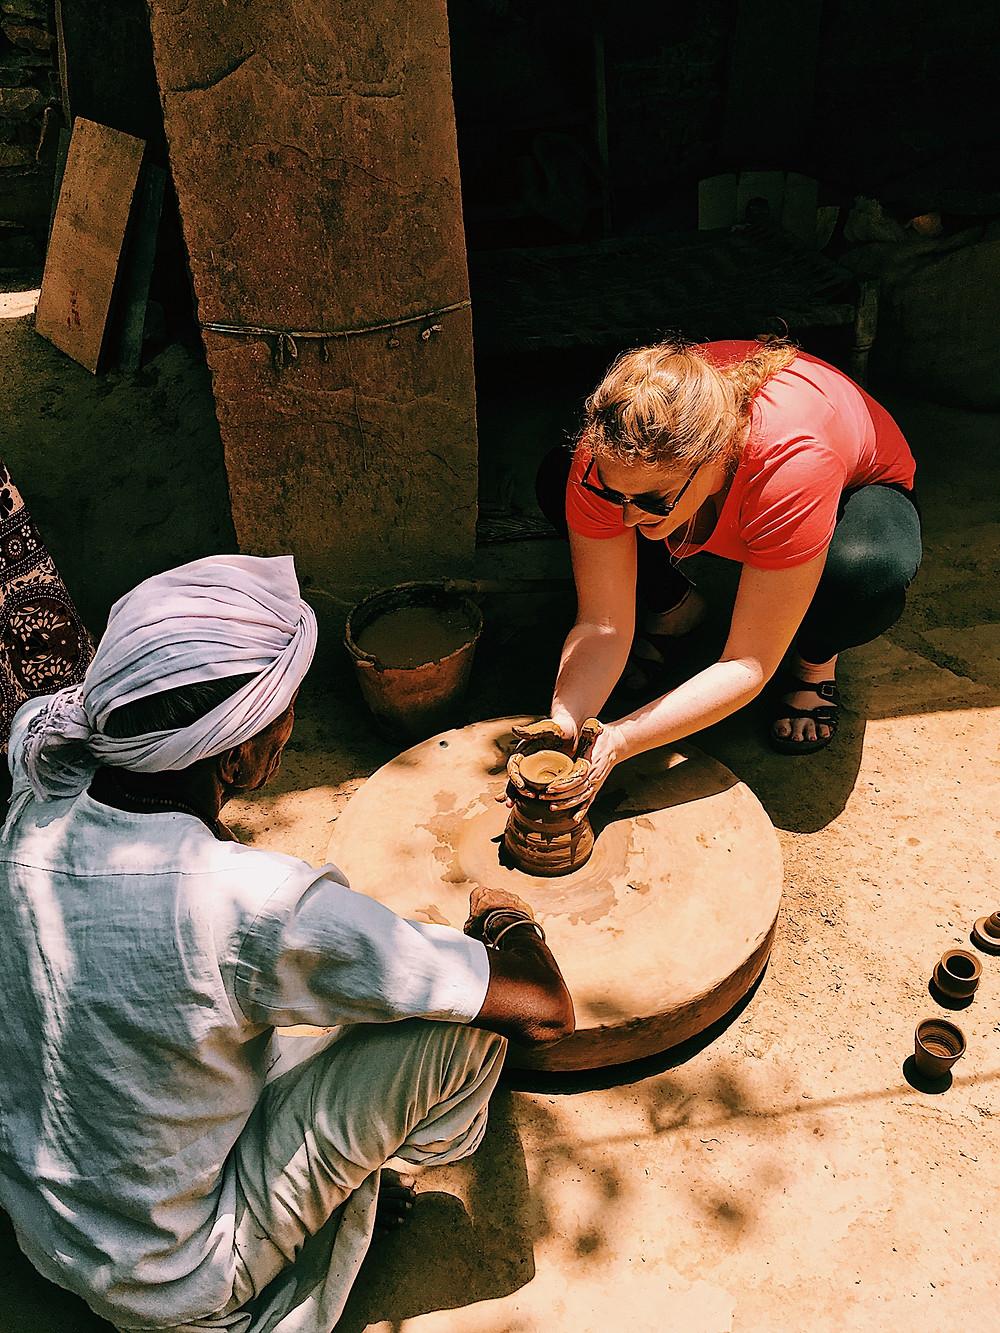 Leah making pottery via a hand spun wheel